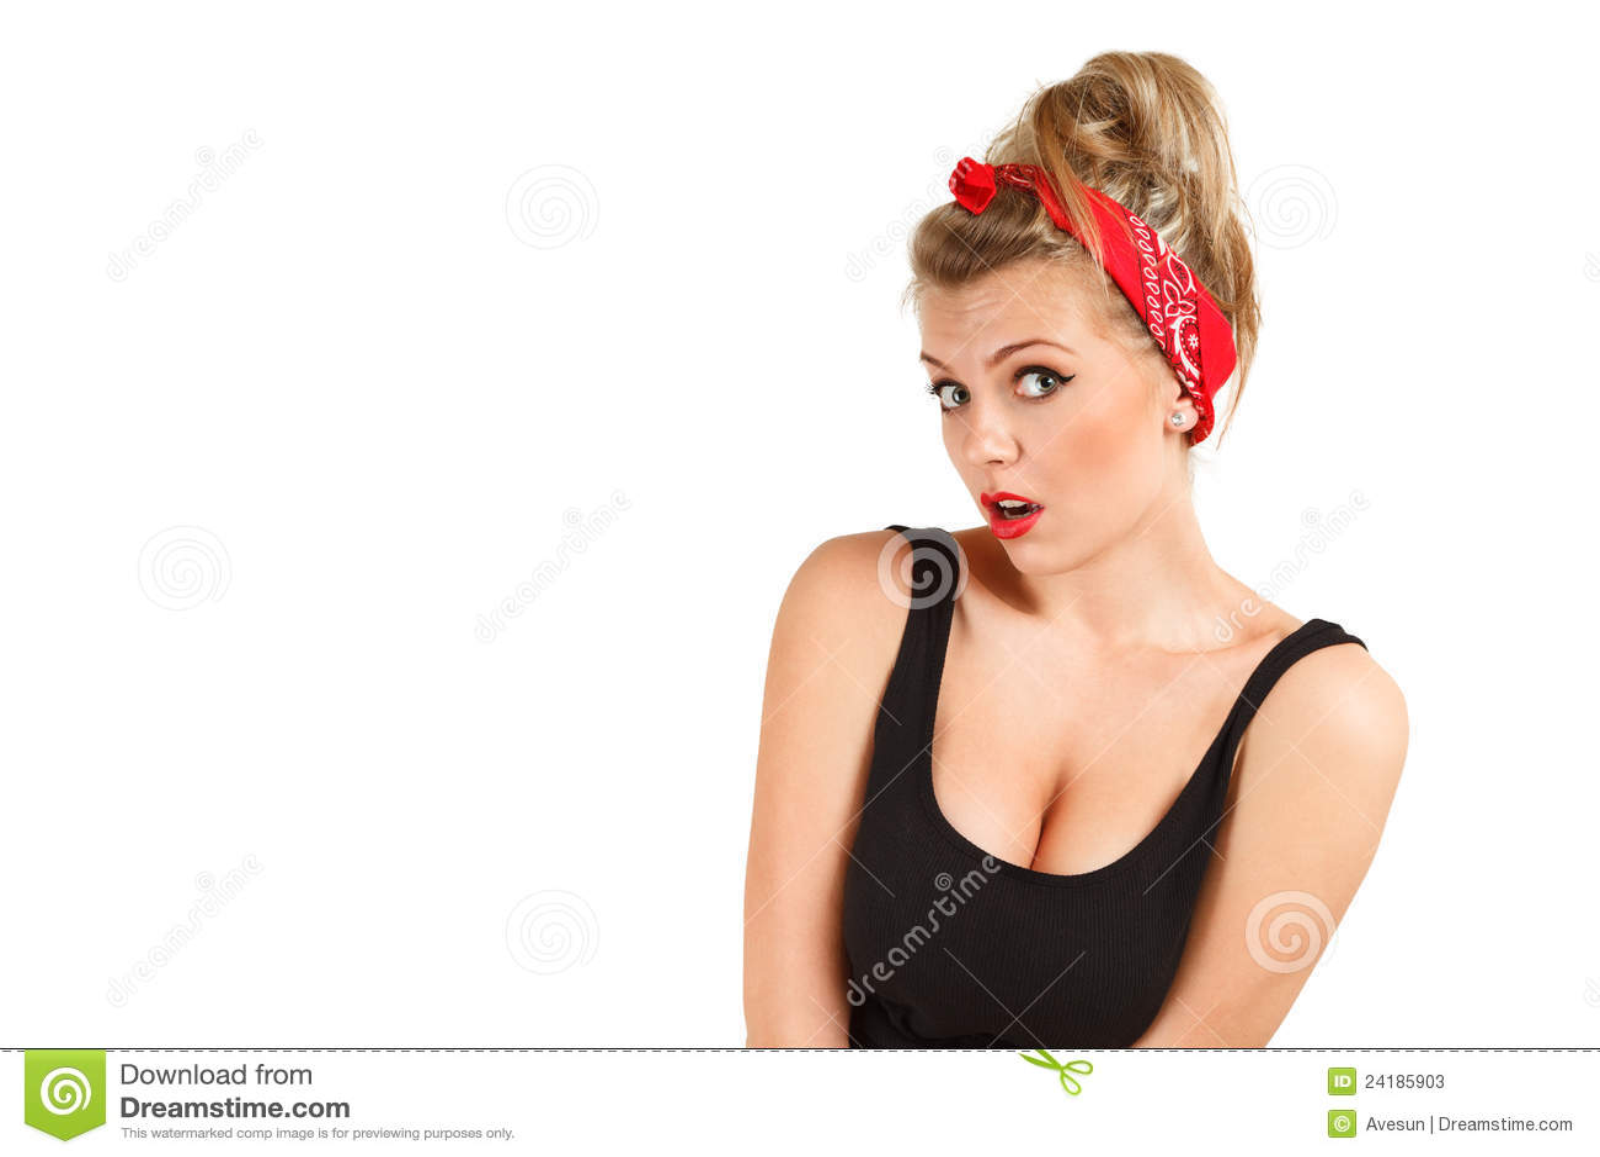 Surprised pin-up girl stock image. Image of headshot - 24185903